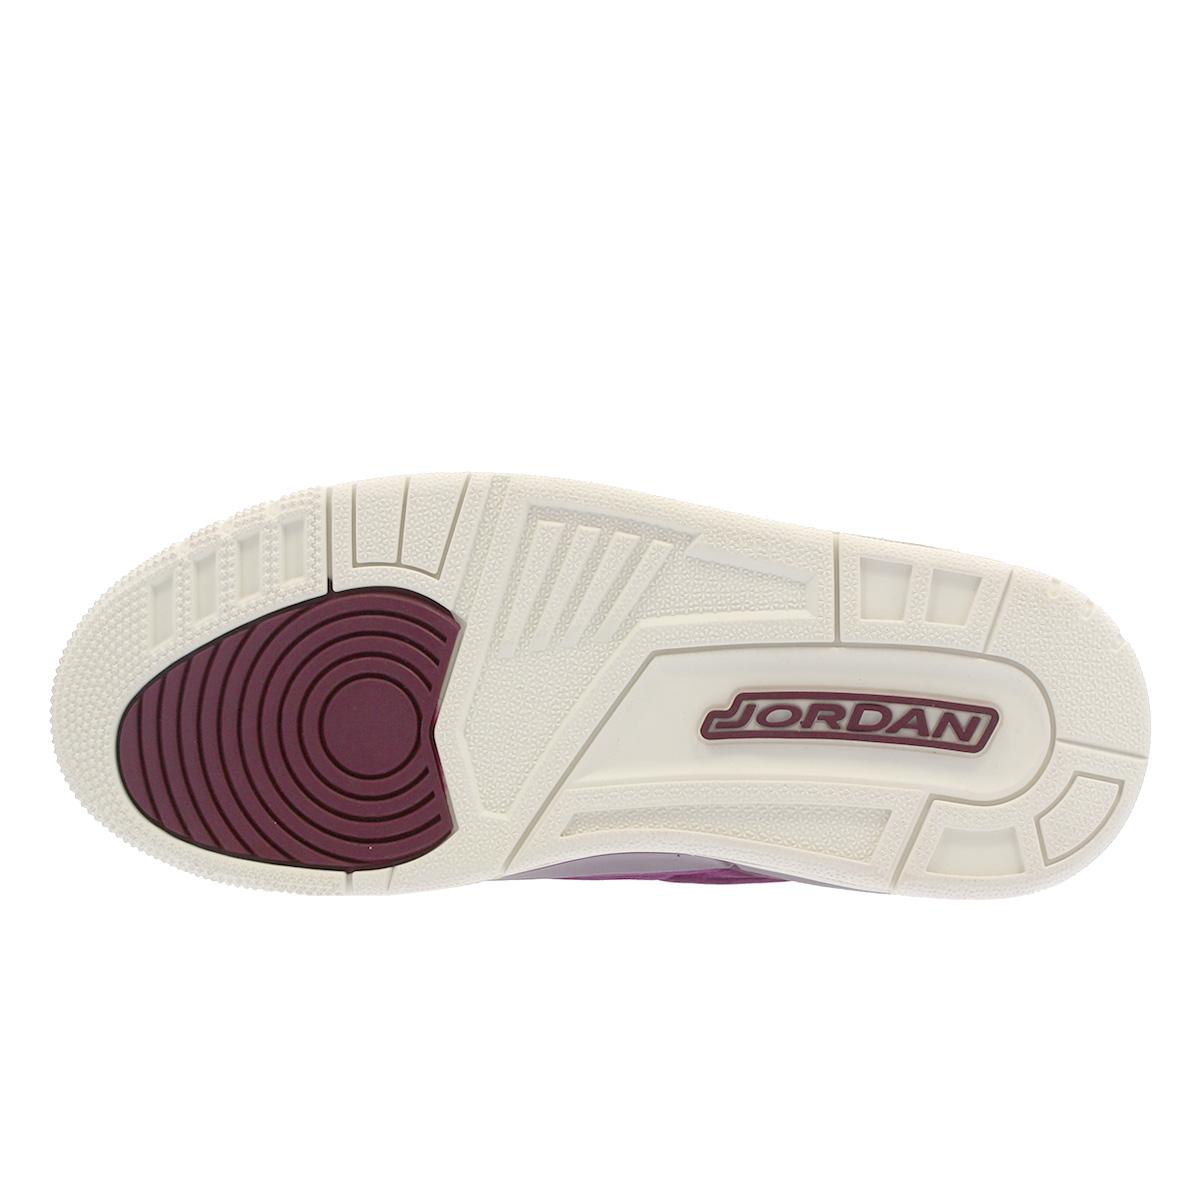 factory authentic d9bca b8cf4 ... NIKE WMNS AIR JORDAN 3 RETRO SE Nike women Air Jordan 3 nostalgic SE  BORDEAUX  ...